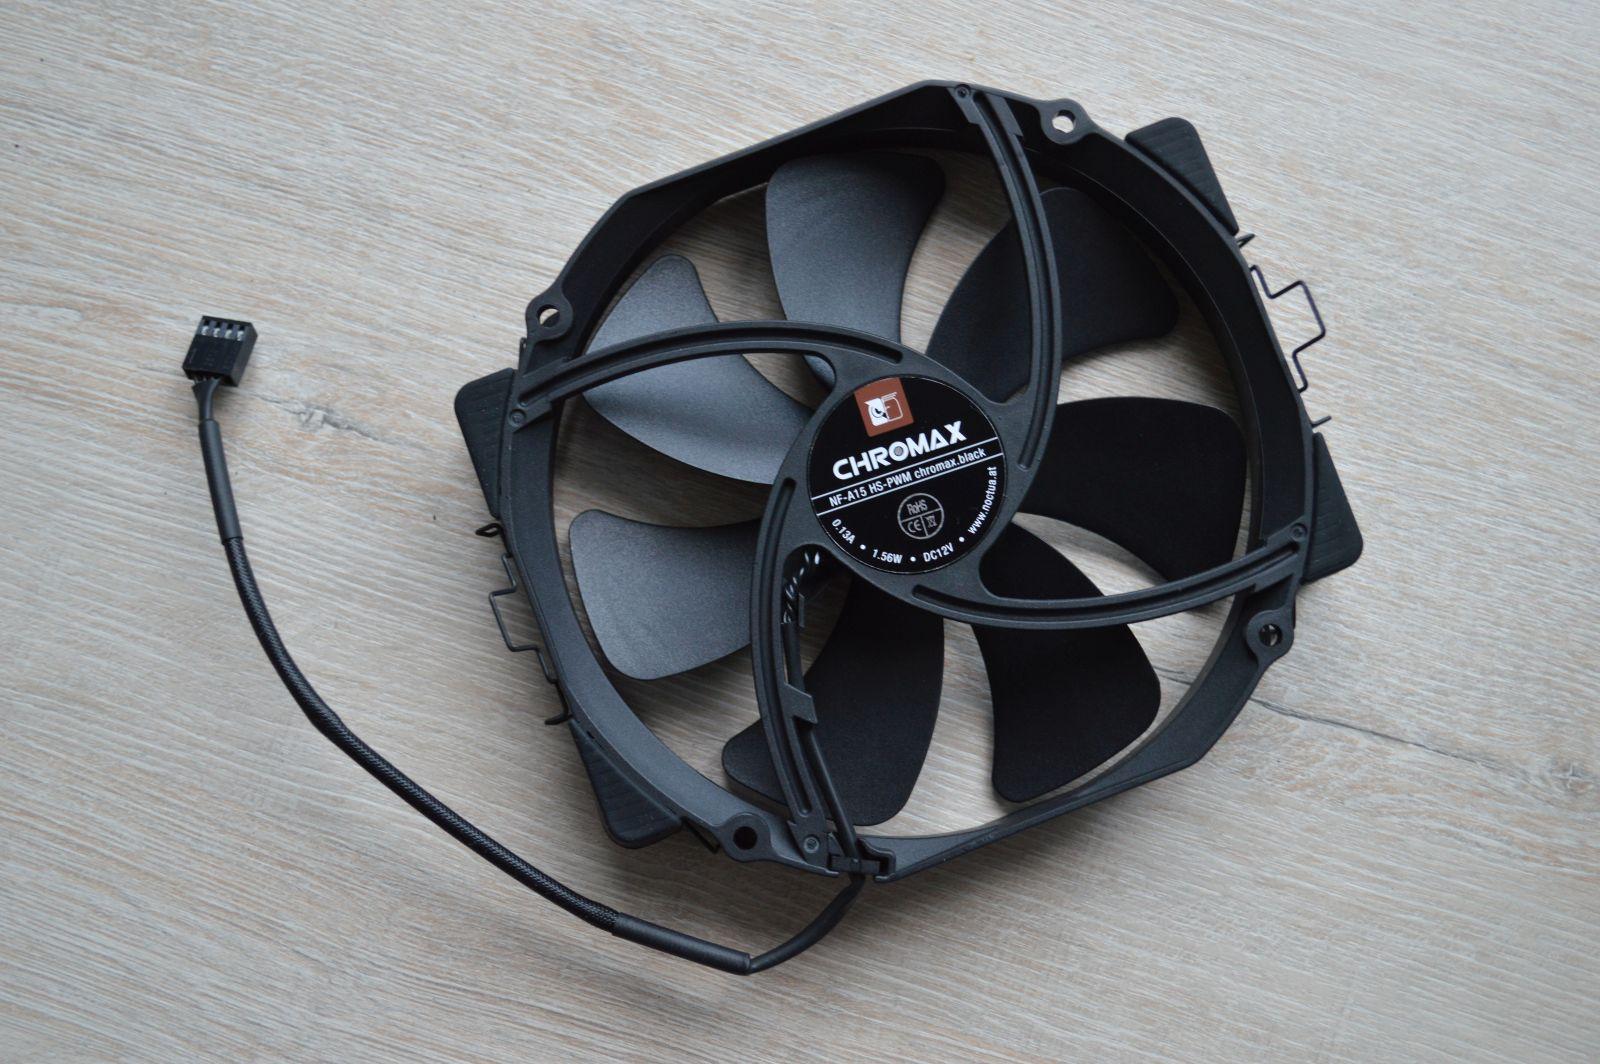 NH-D15S chromax.black вентилятор